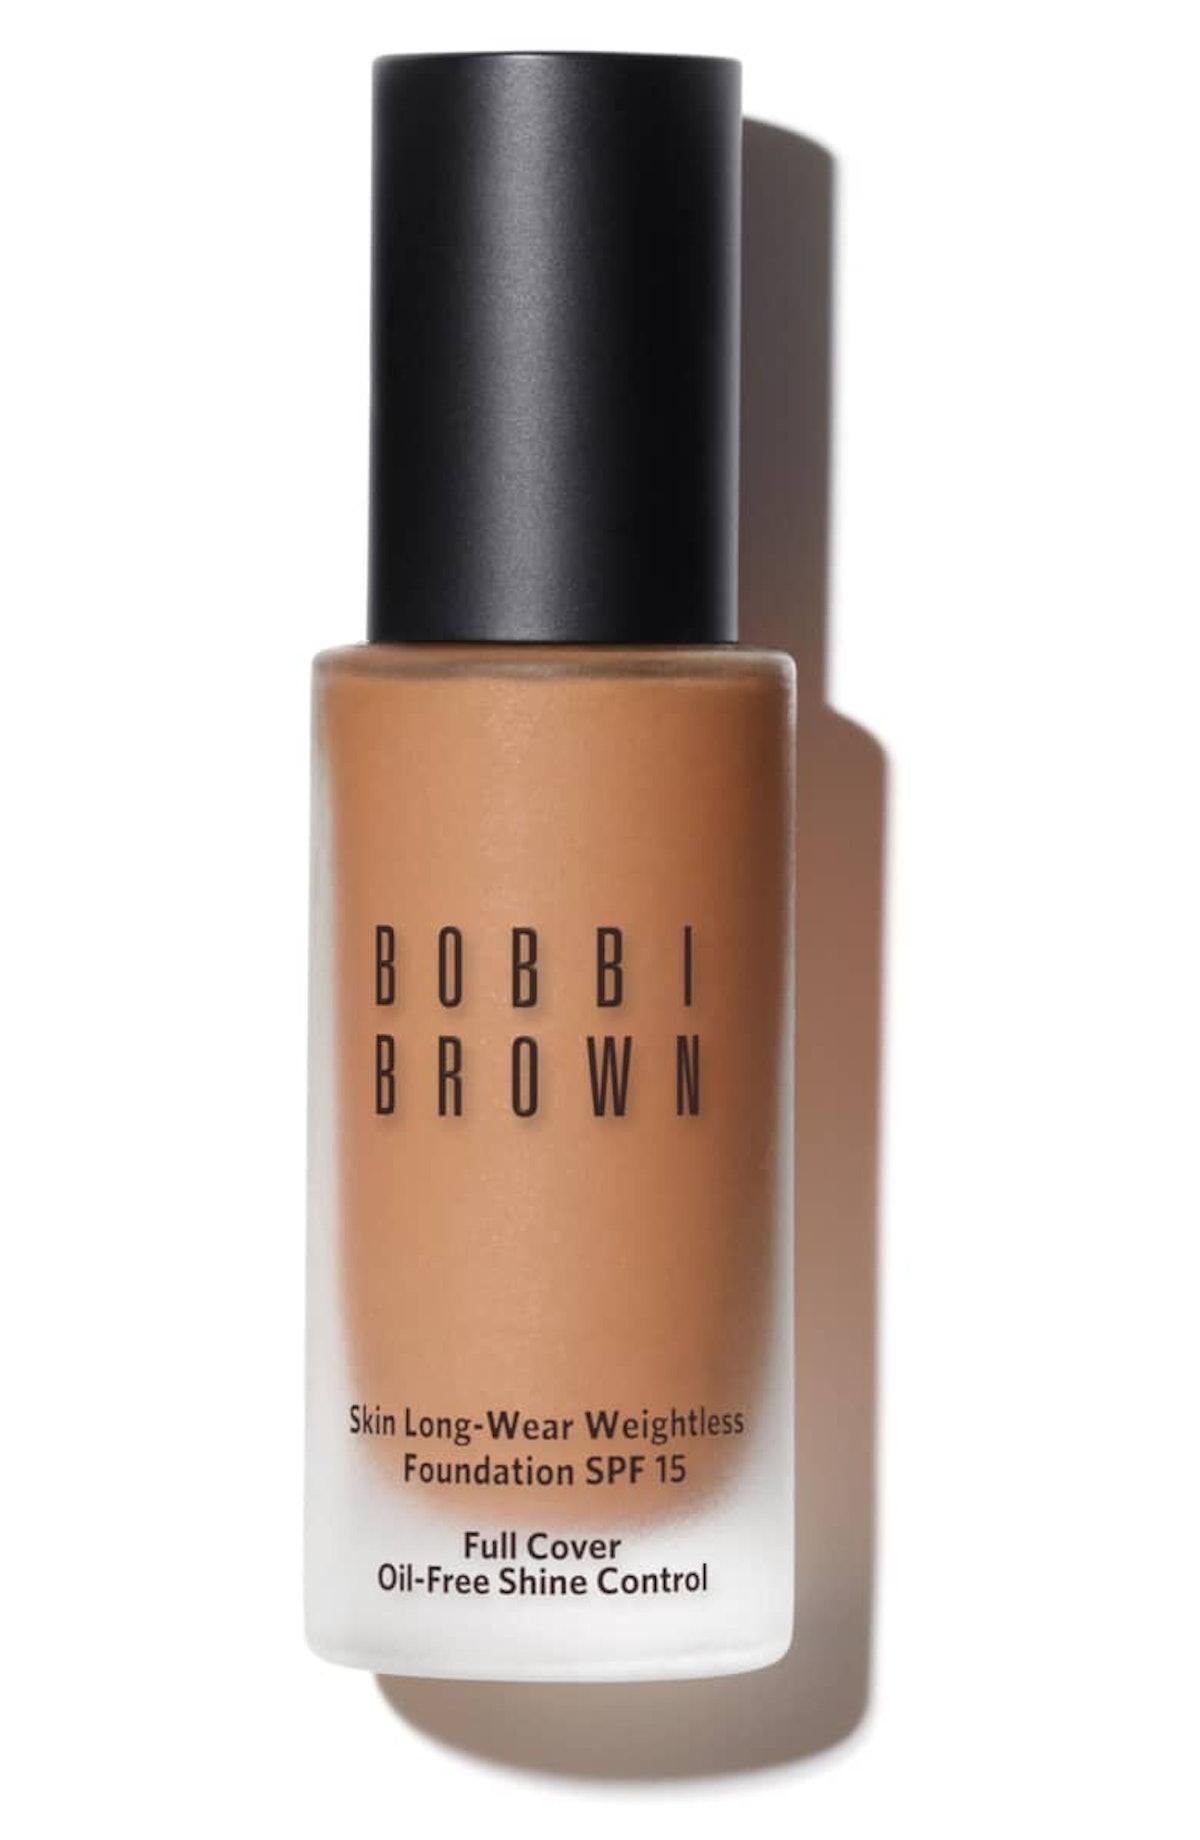 Bobbi Brown Skin Long-Wear Weightless Foundation SPF 15